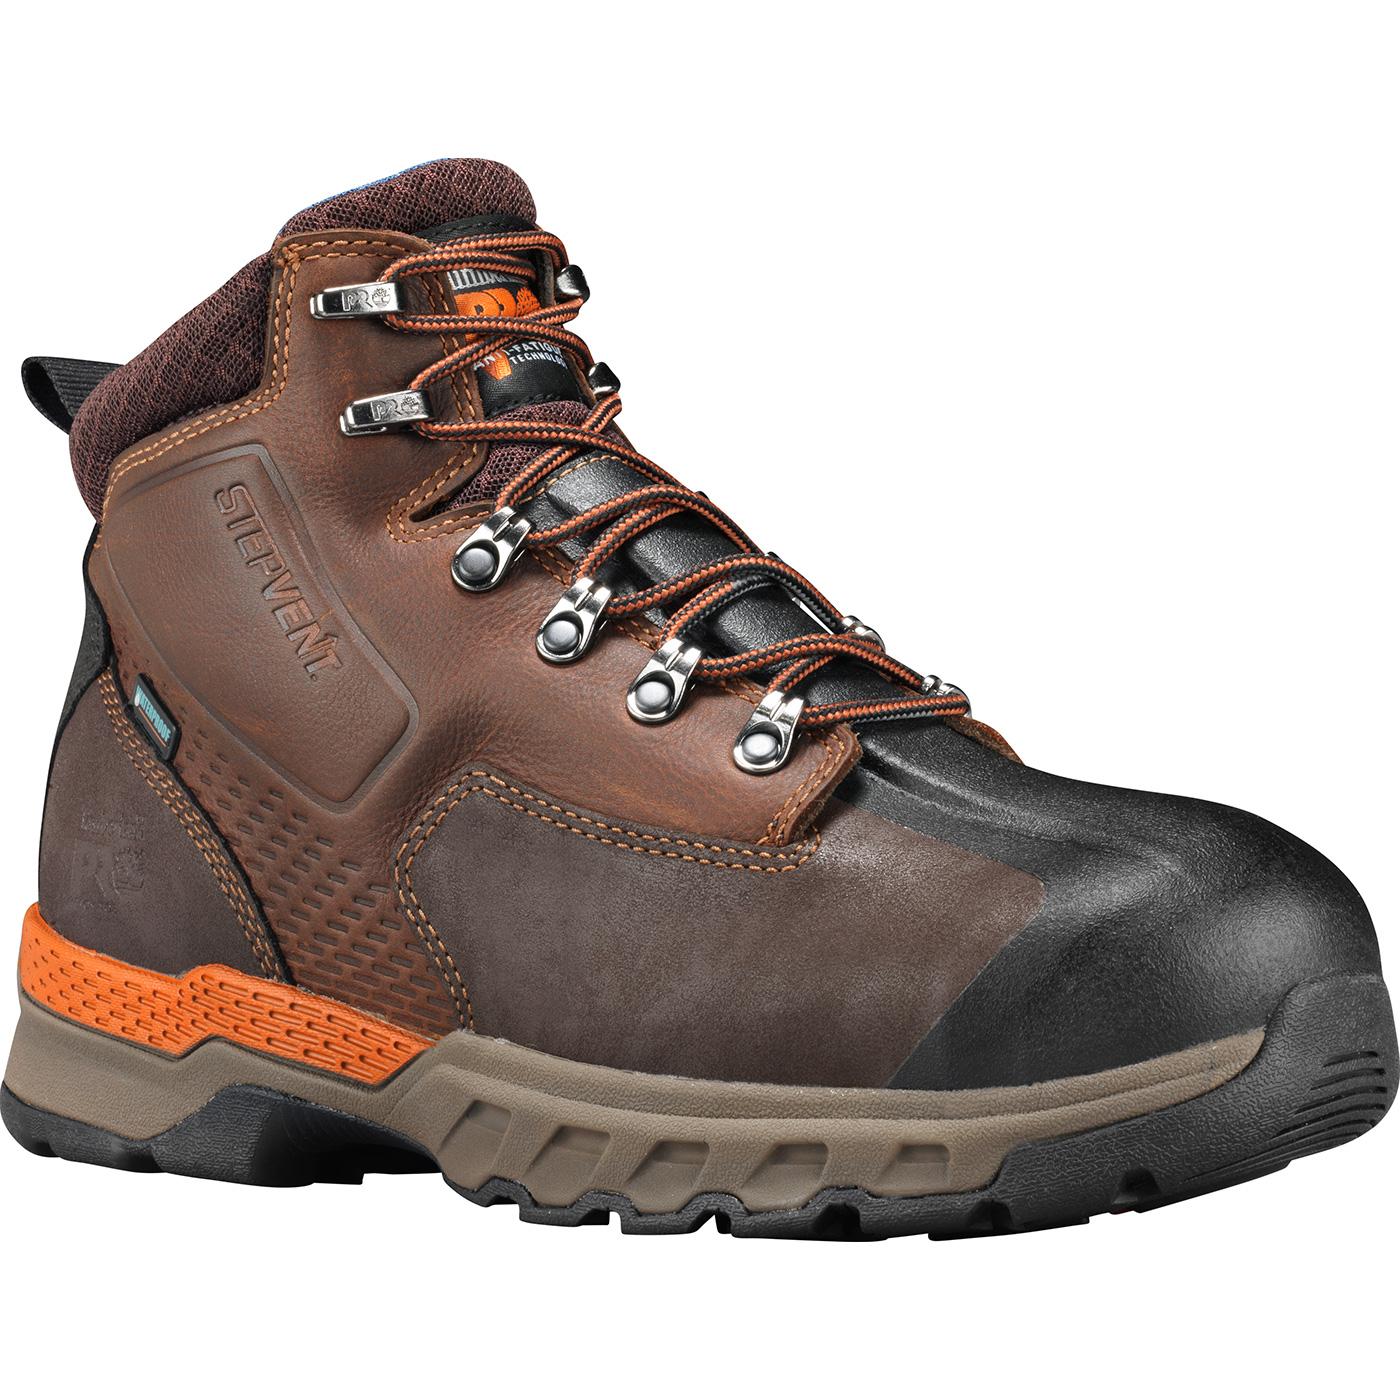 278dbbf2278 Timberland PRO Downdraft Men's 6 inch Alloy Toe Electrical Hazard  Waterproof Work Hiker